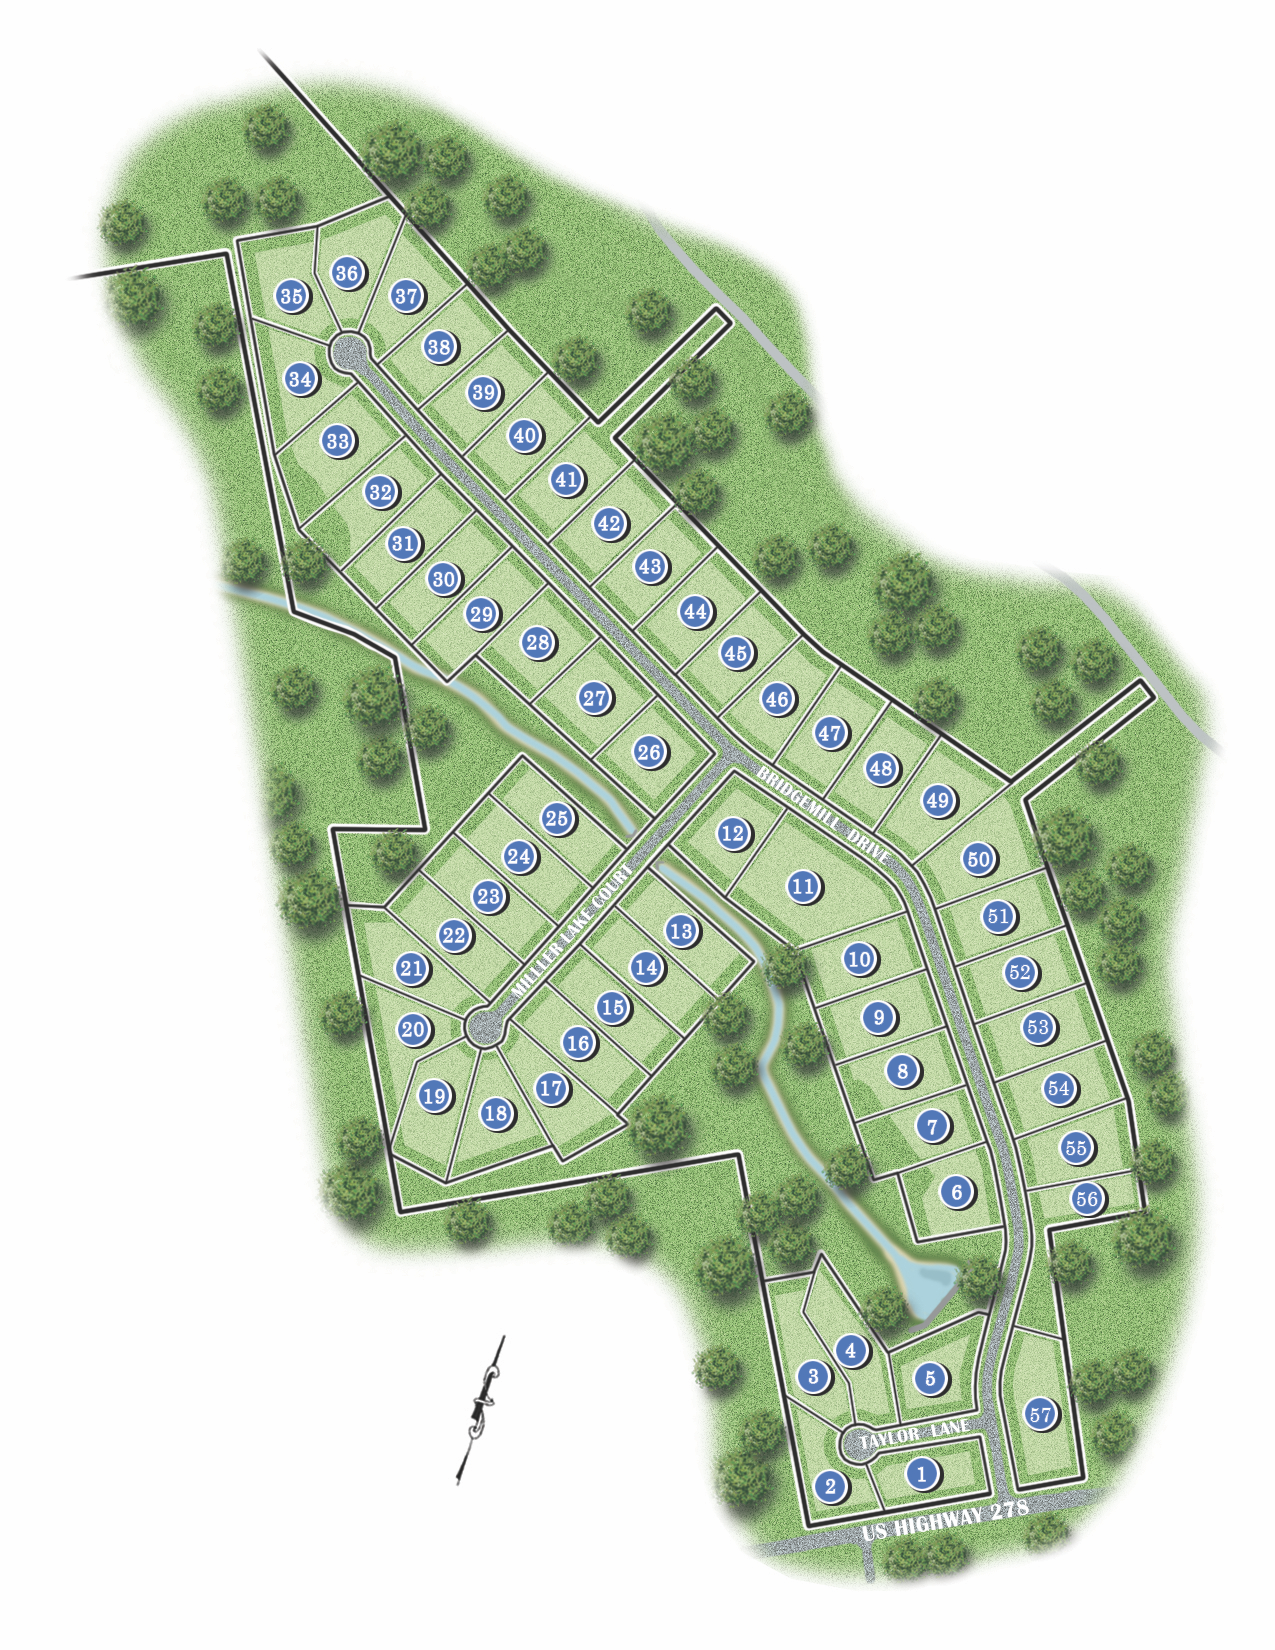 Covington, GA Bridgemill New Homes from Liberty Communities